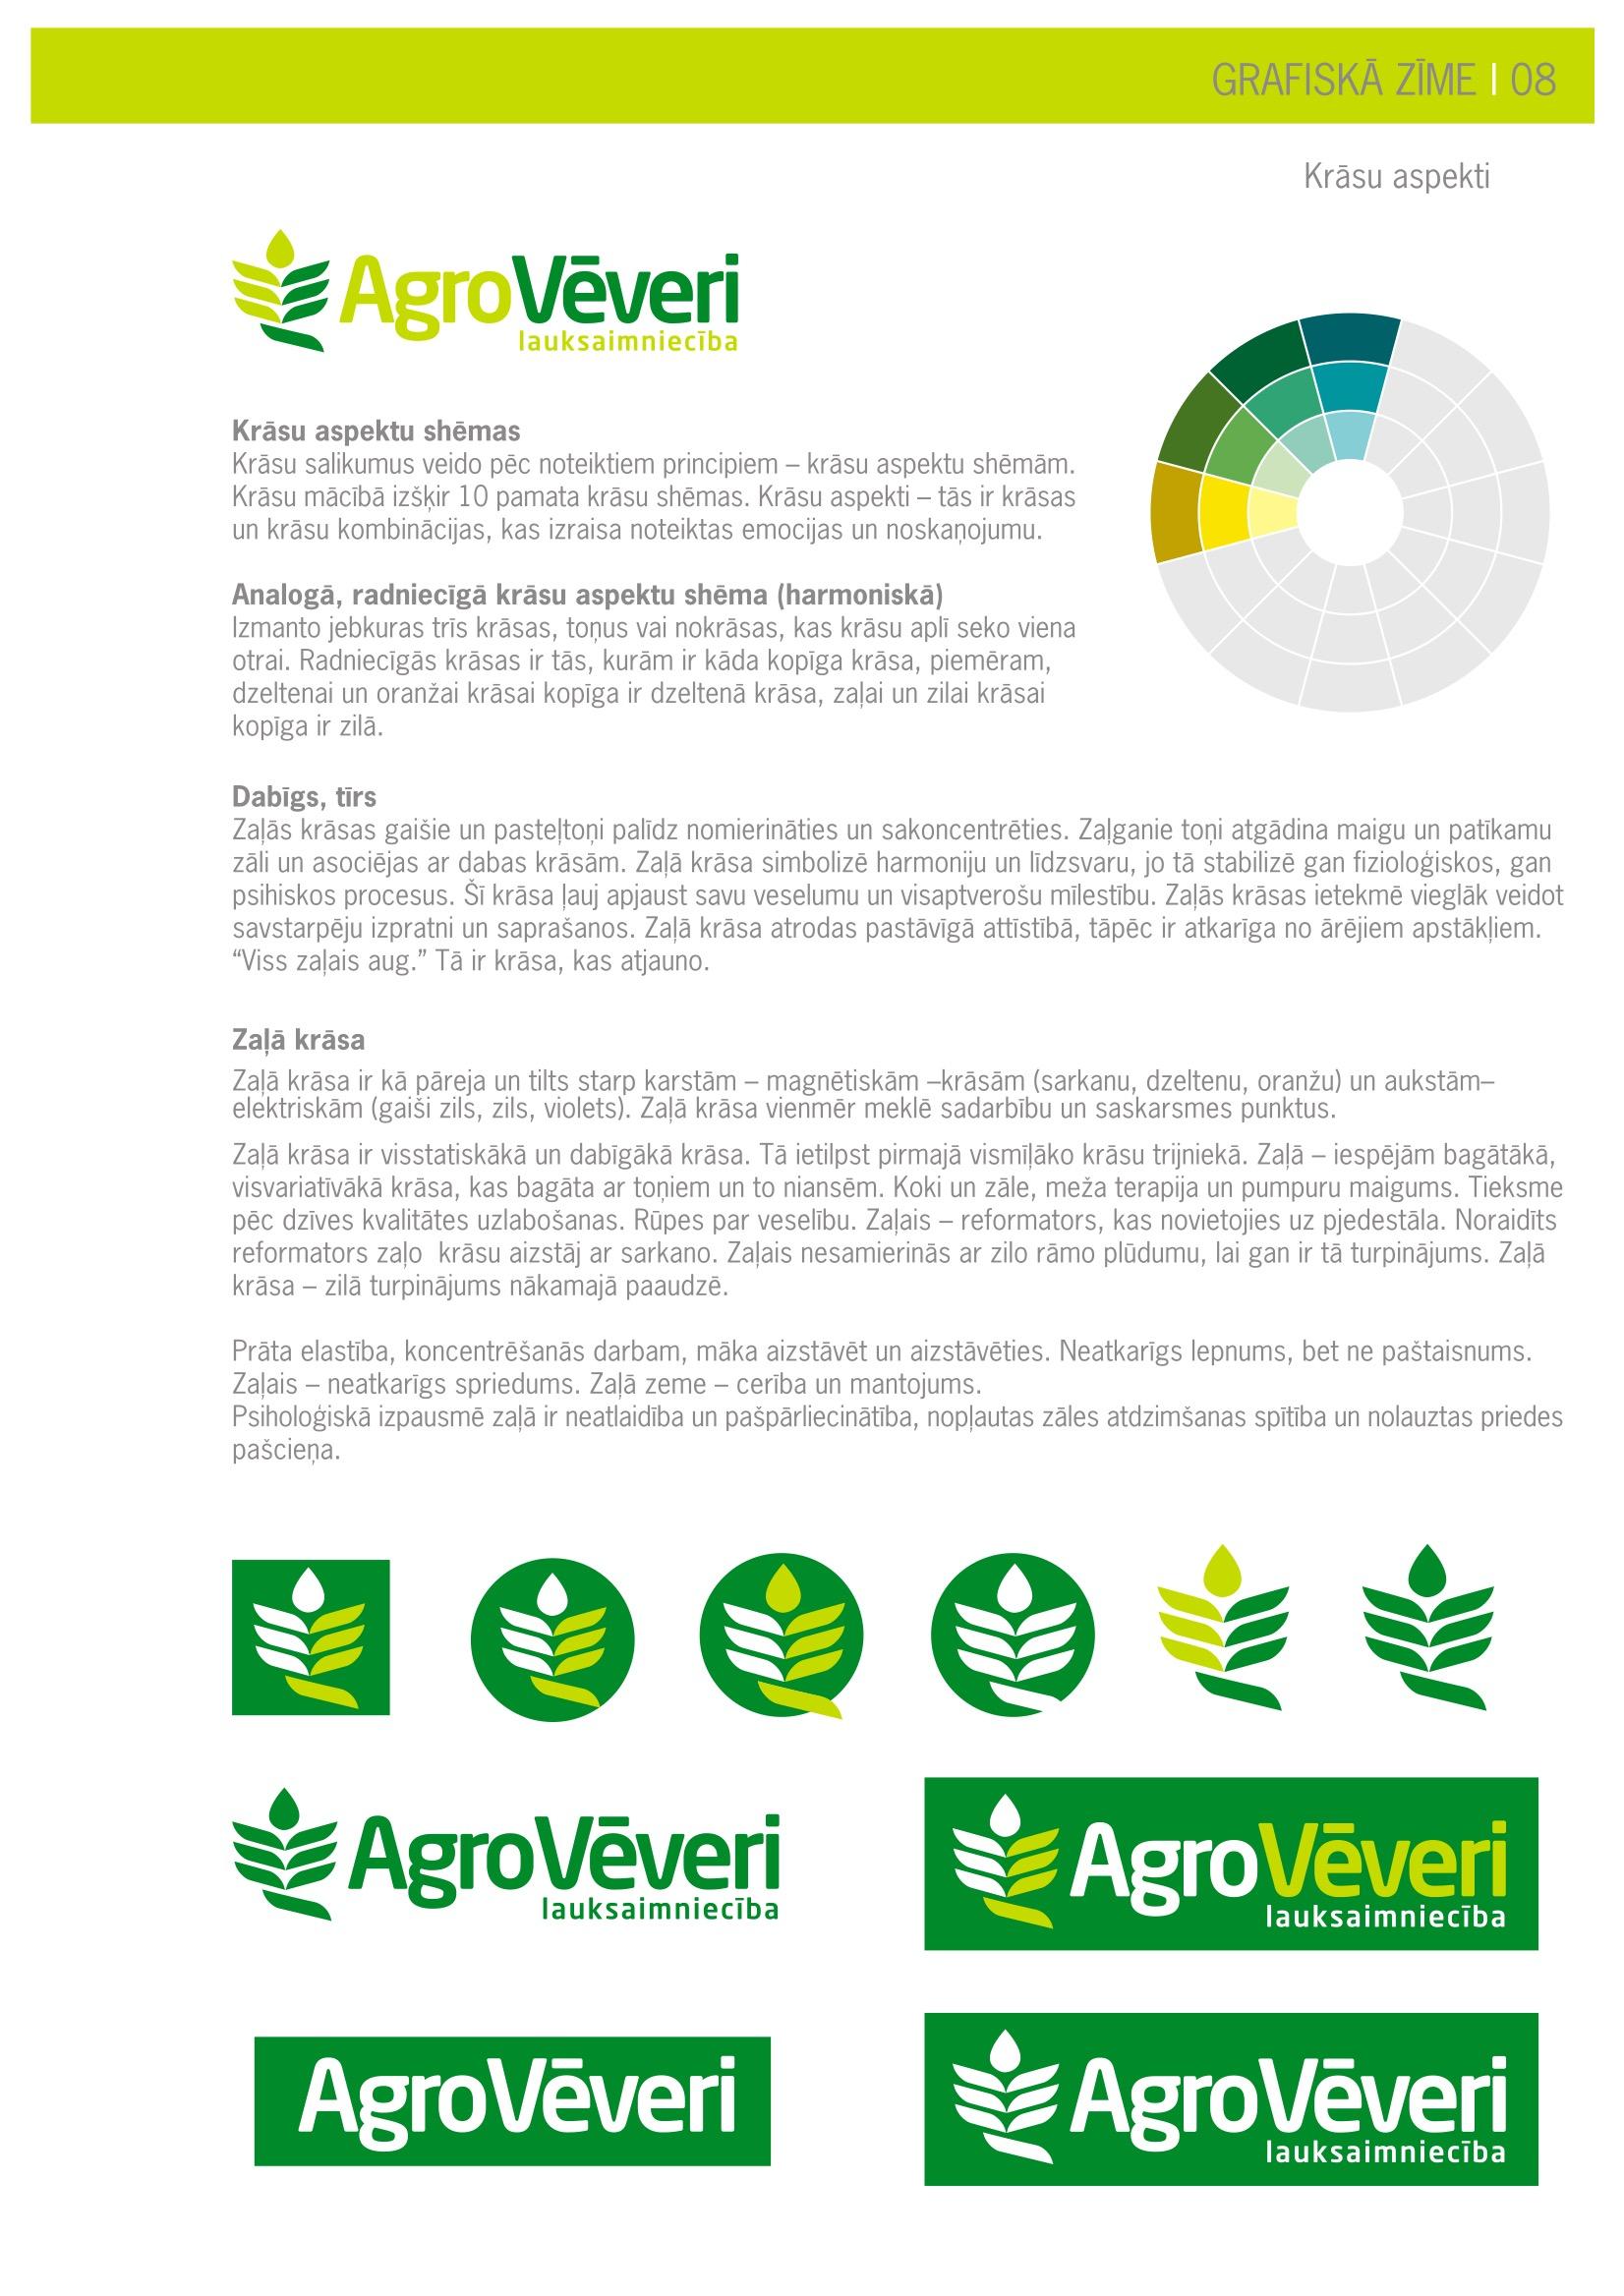 Agroveveri_Stils 9